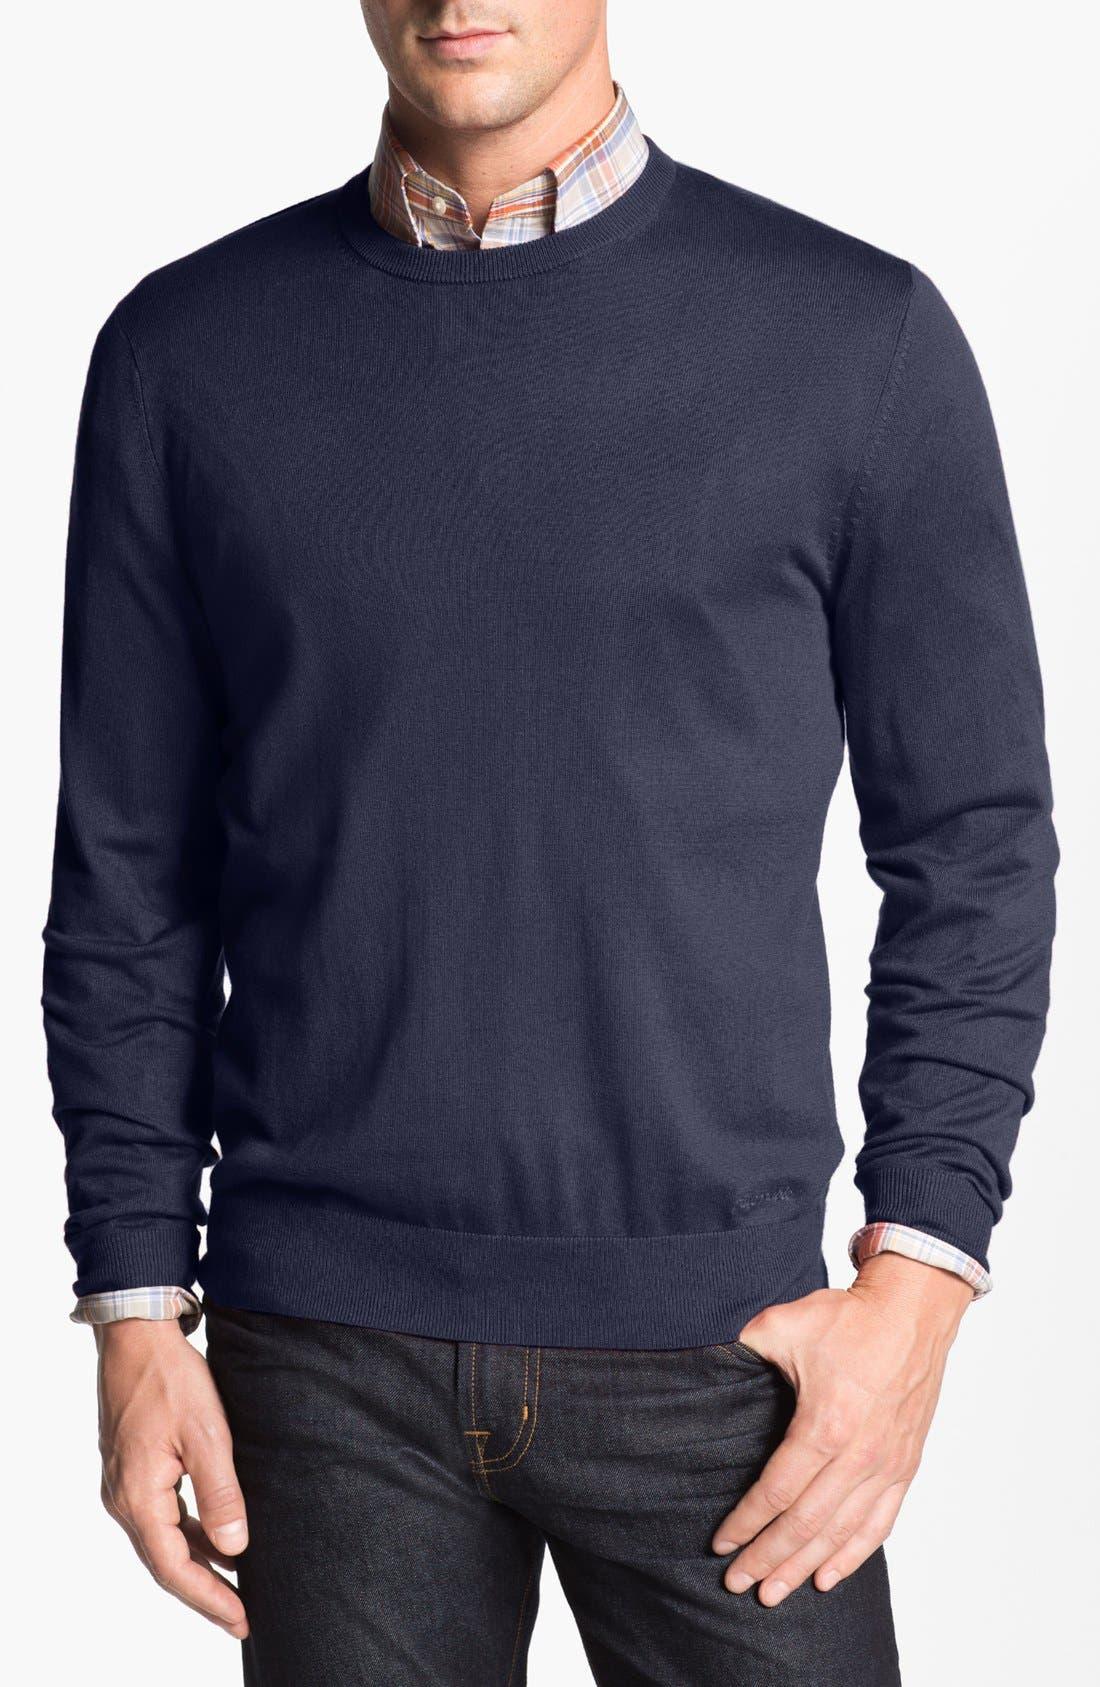 Alternate Image 1 Selected - Façonnable Crewneck 'Sicoca' Silk Blend Sweater